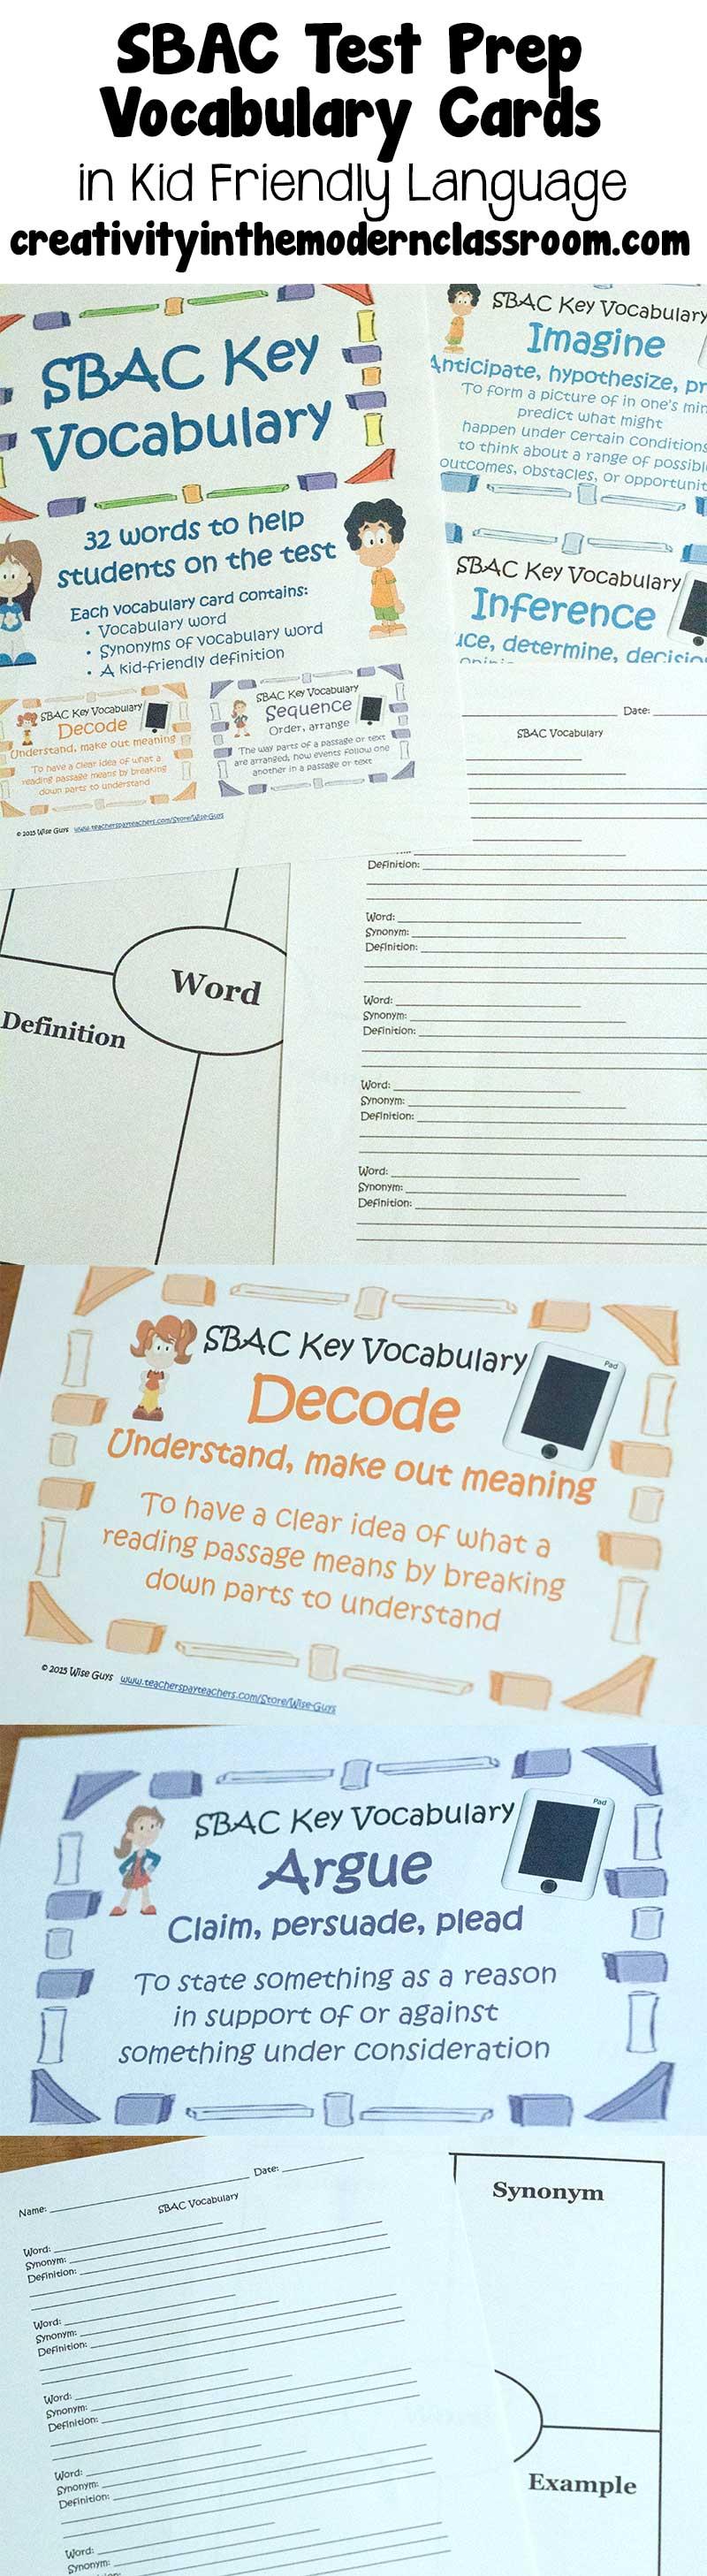 sbac vocabulary cards  kid friendly language